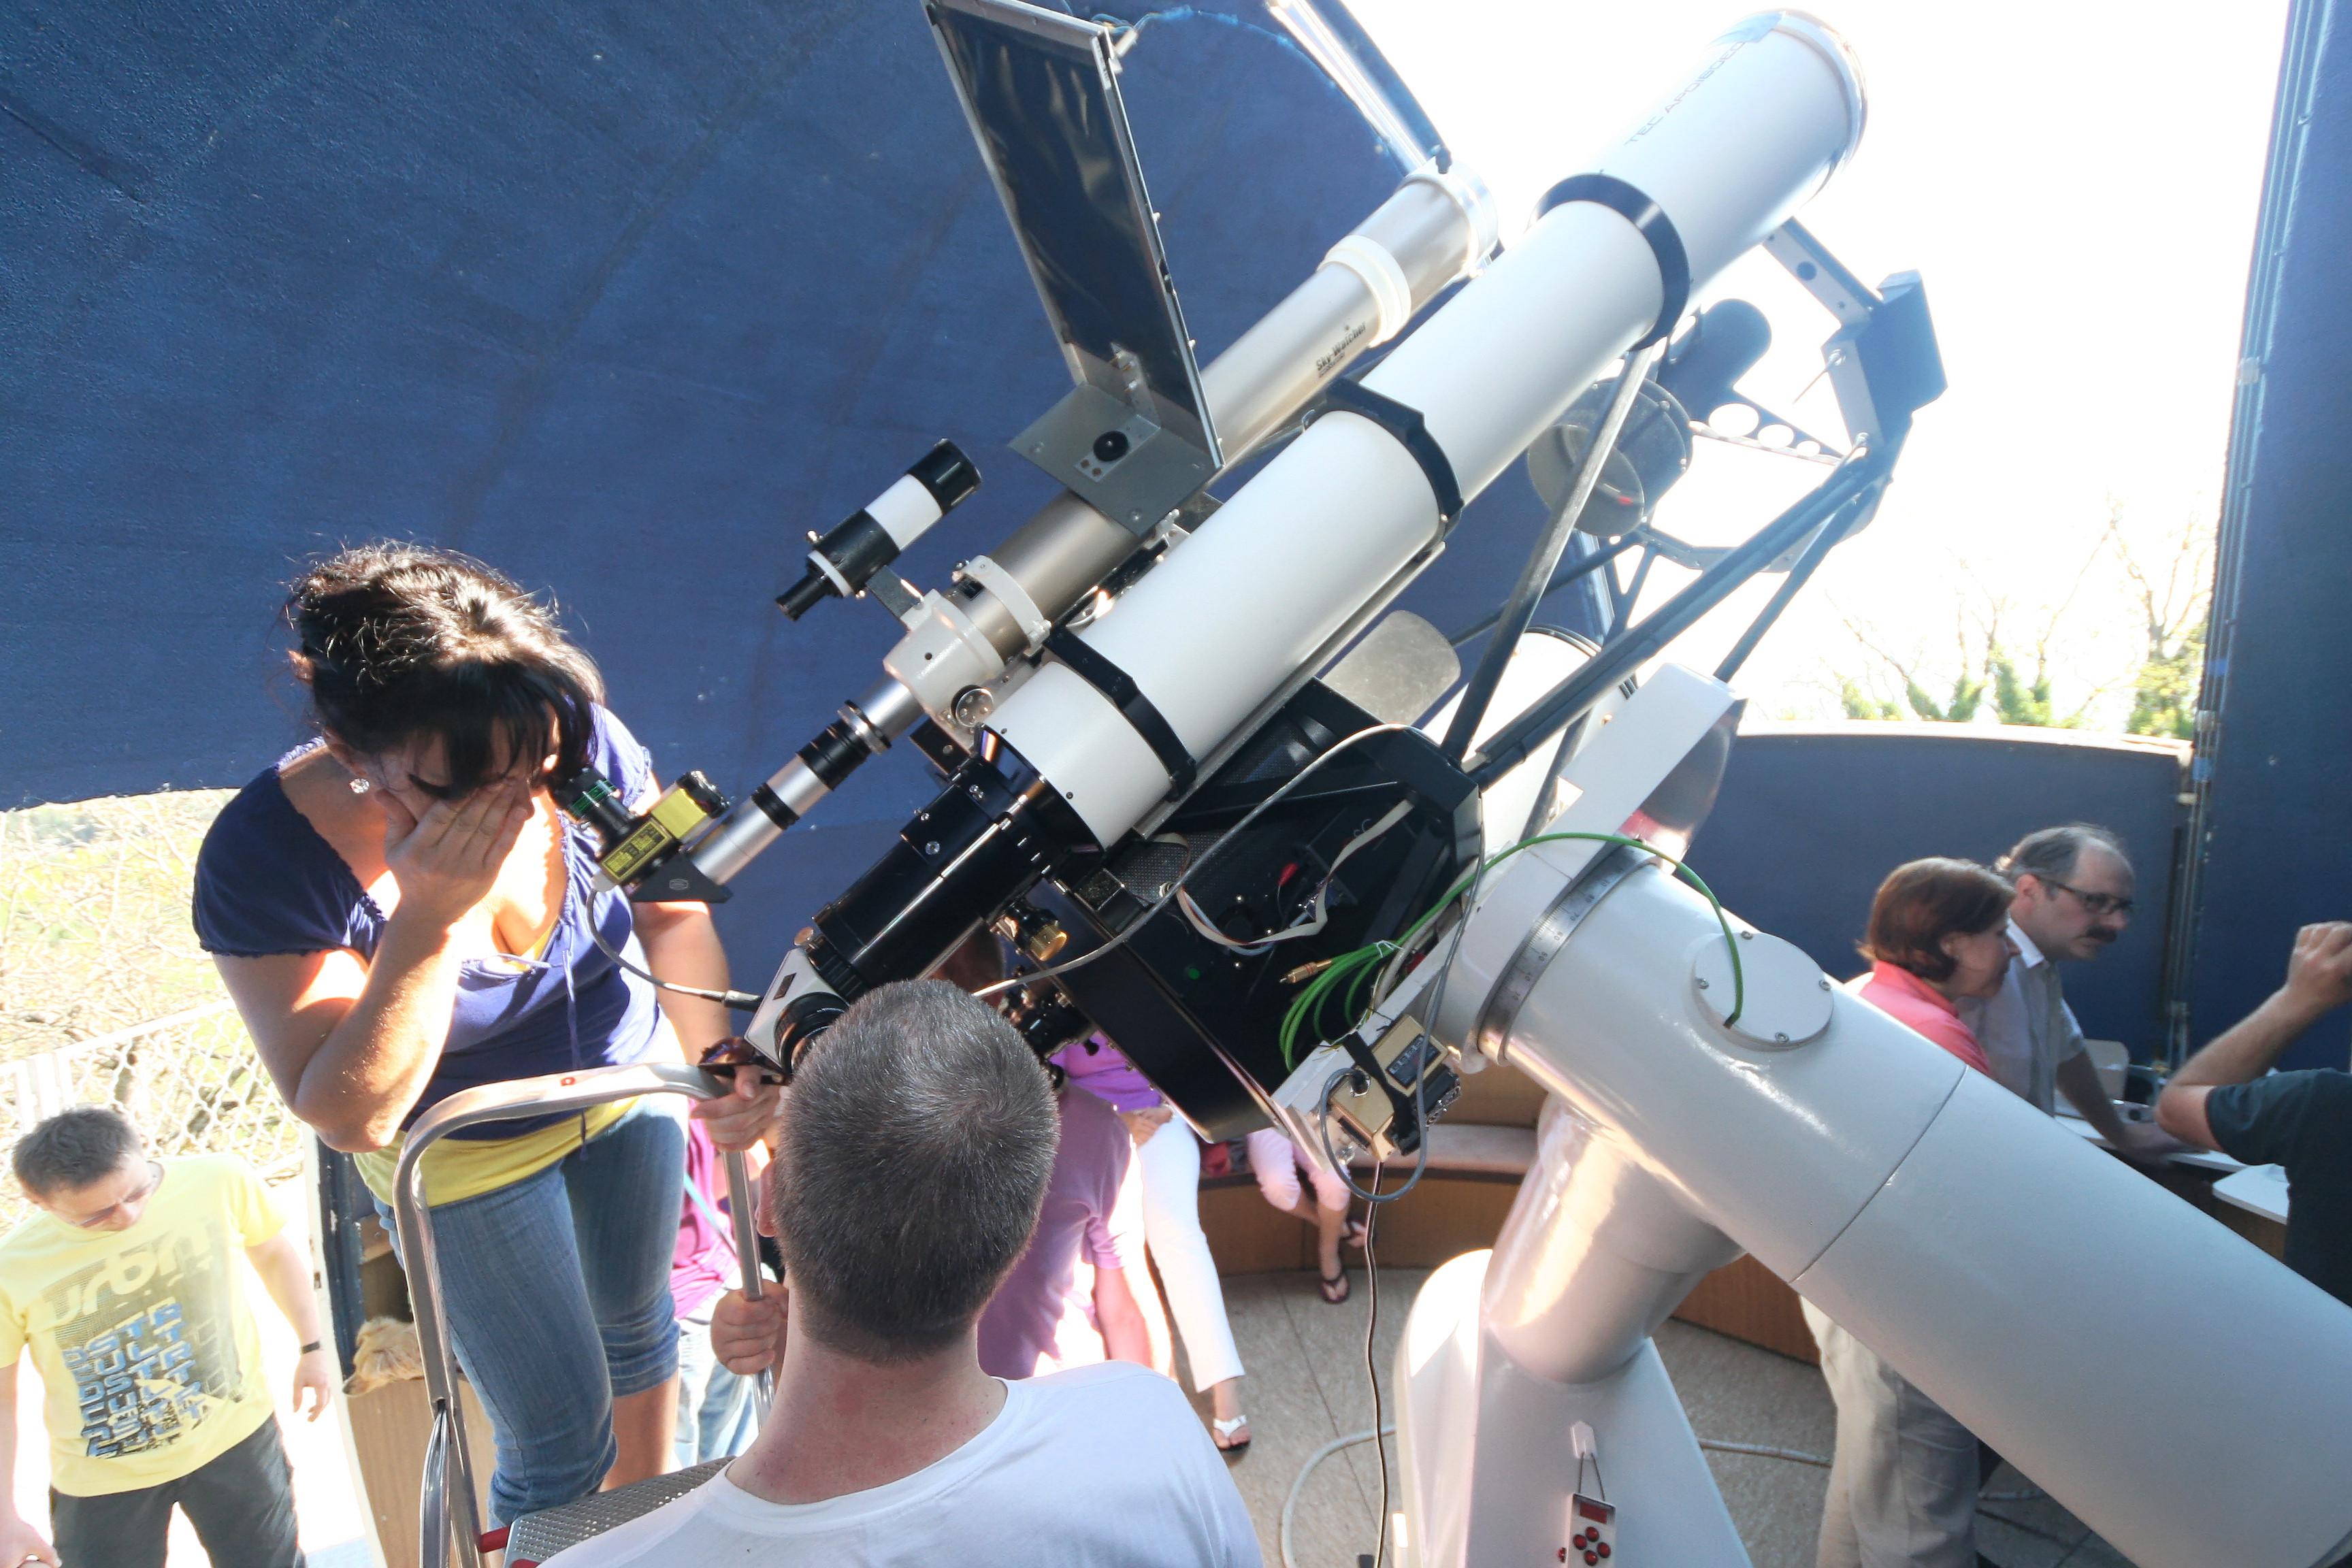 Einweihungsfeier 51cm-Teleskop